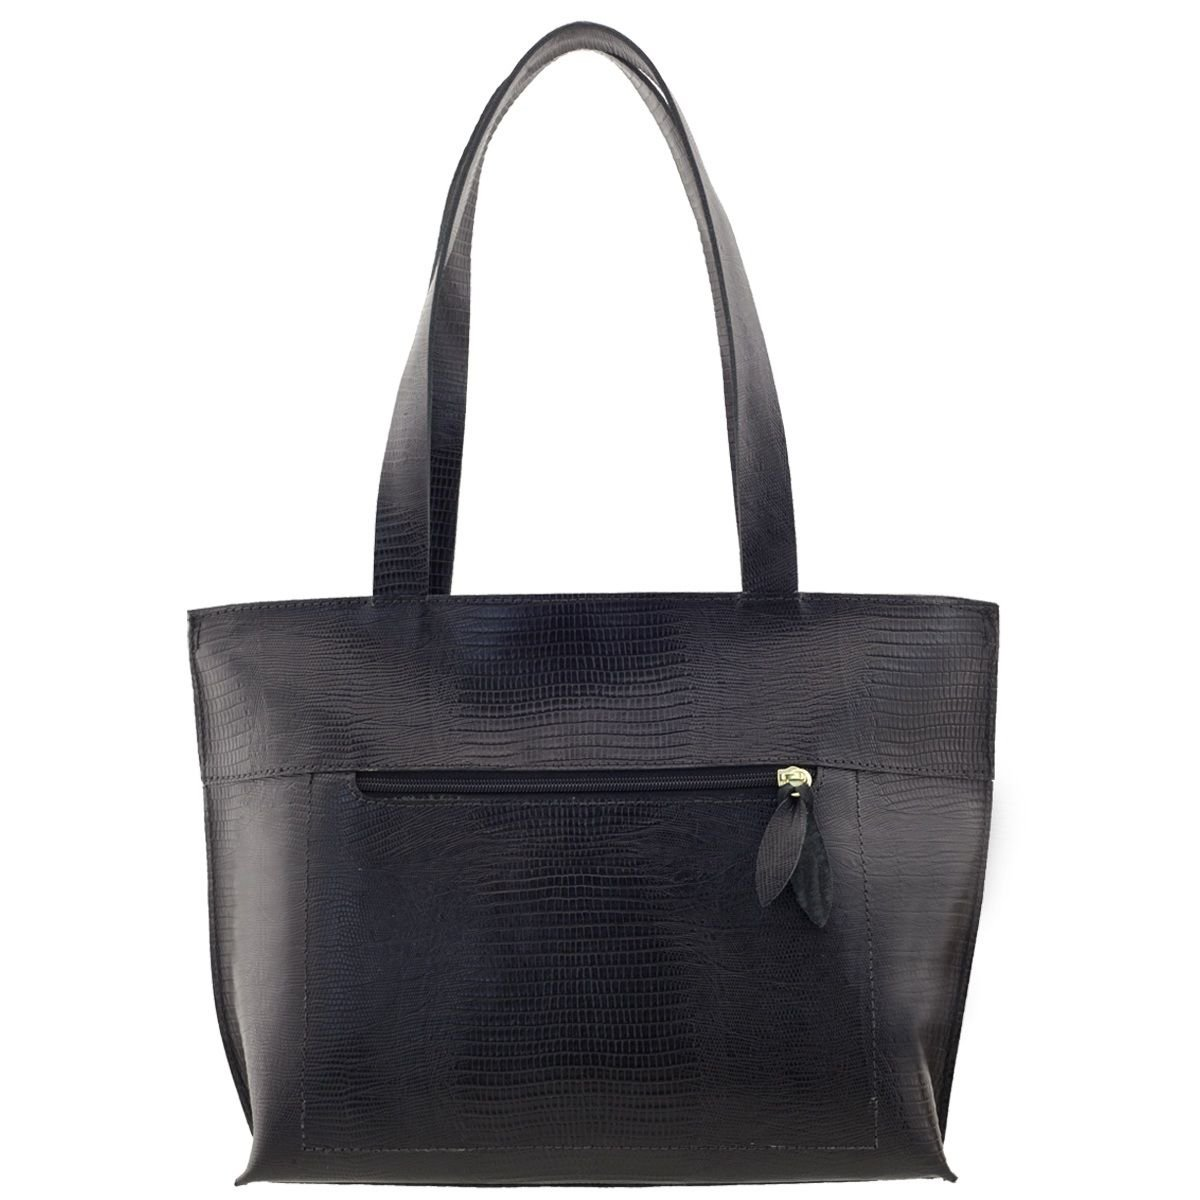 Bolsa Feminina de Couro Black